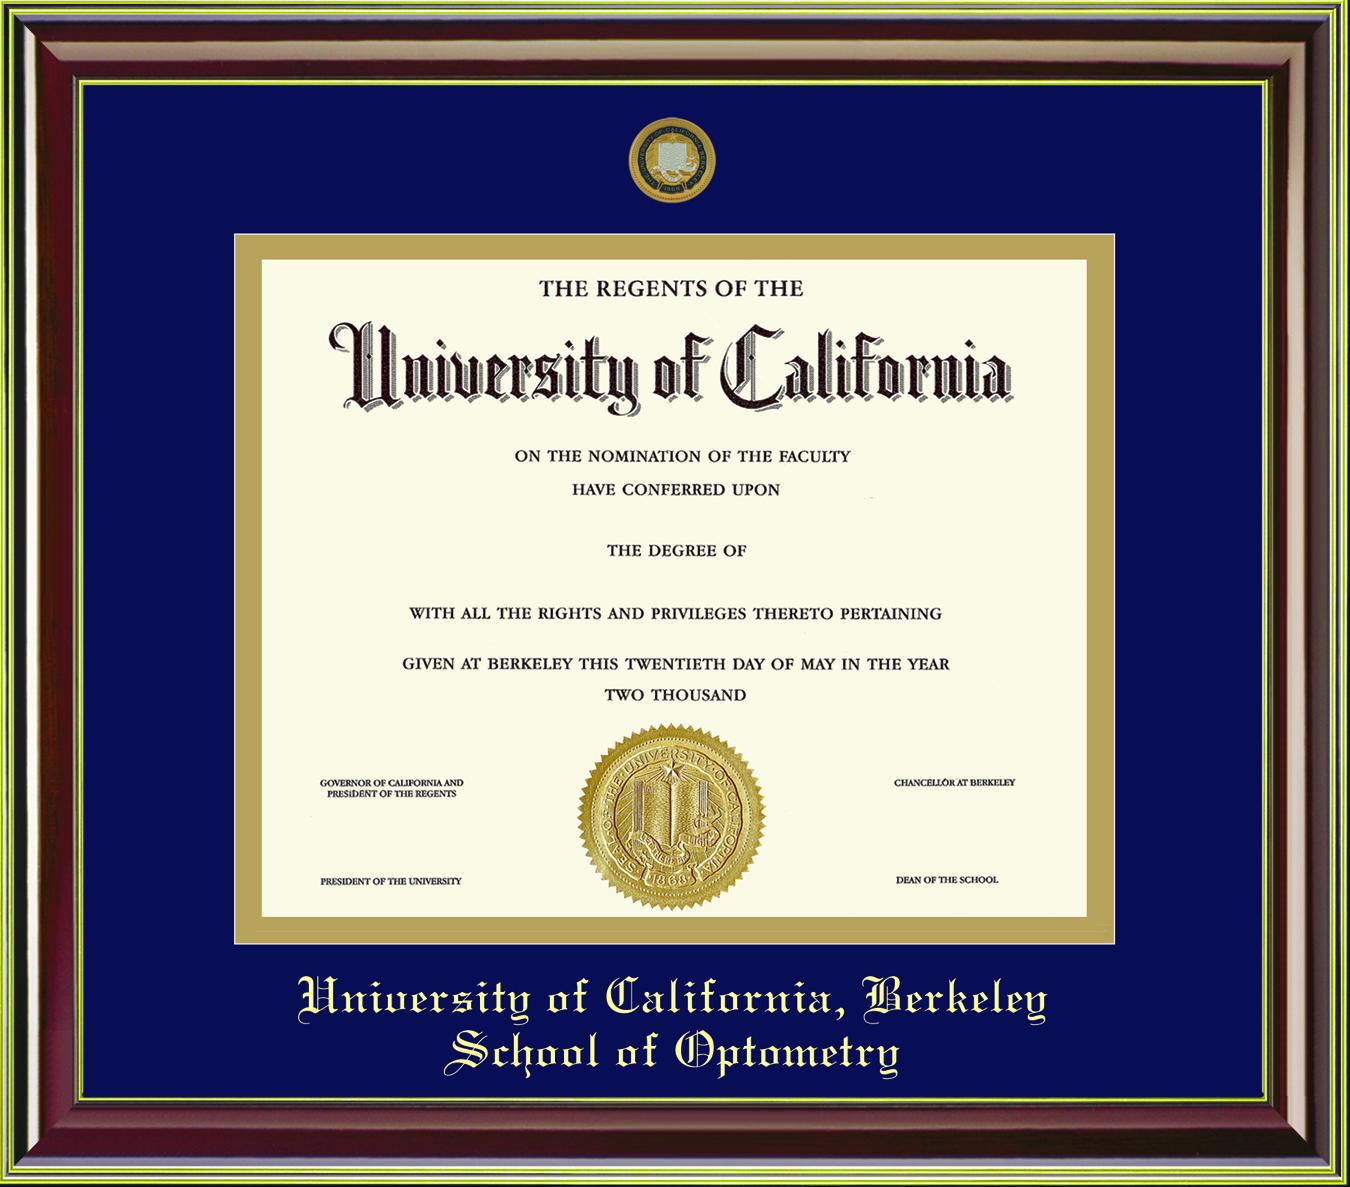 Diploma Frame Mahogany Gold 11x14 School of Optometry